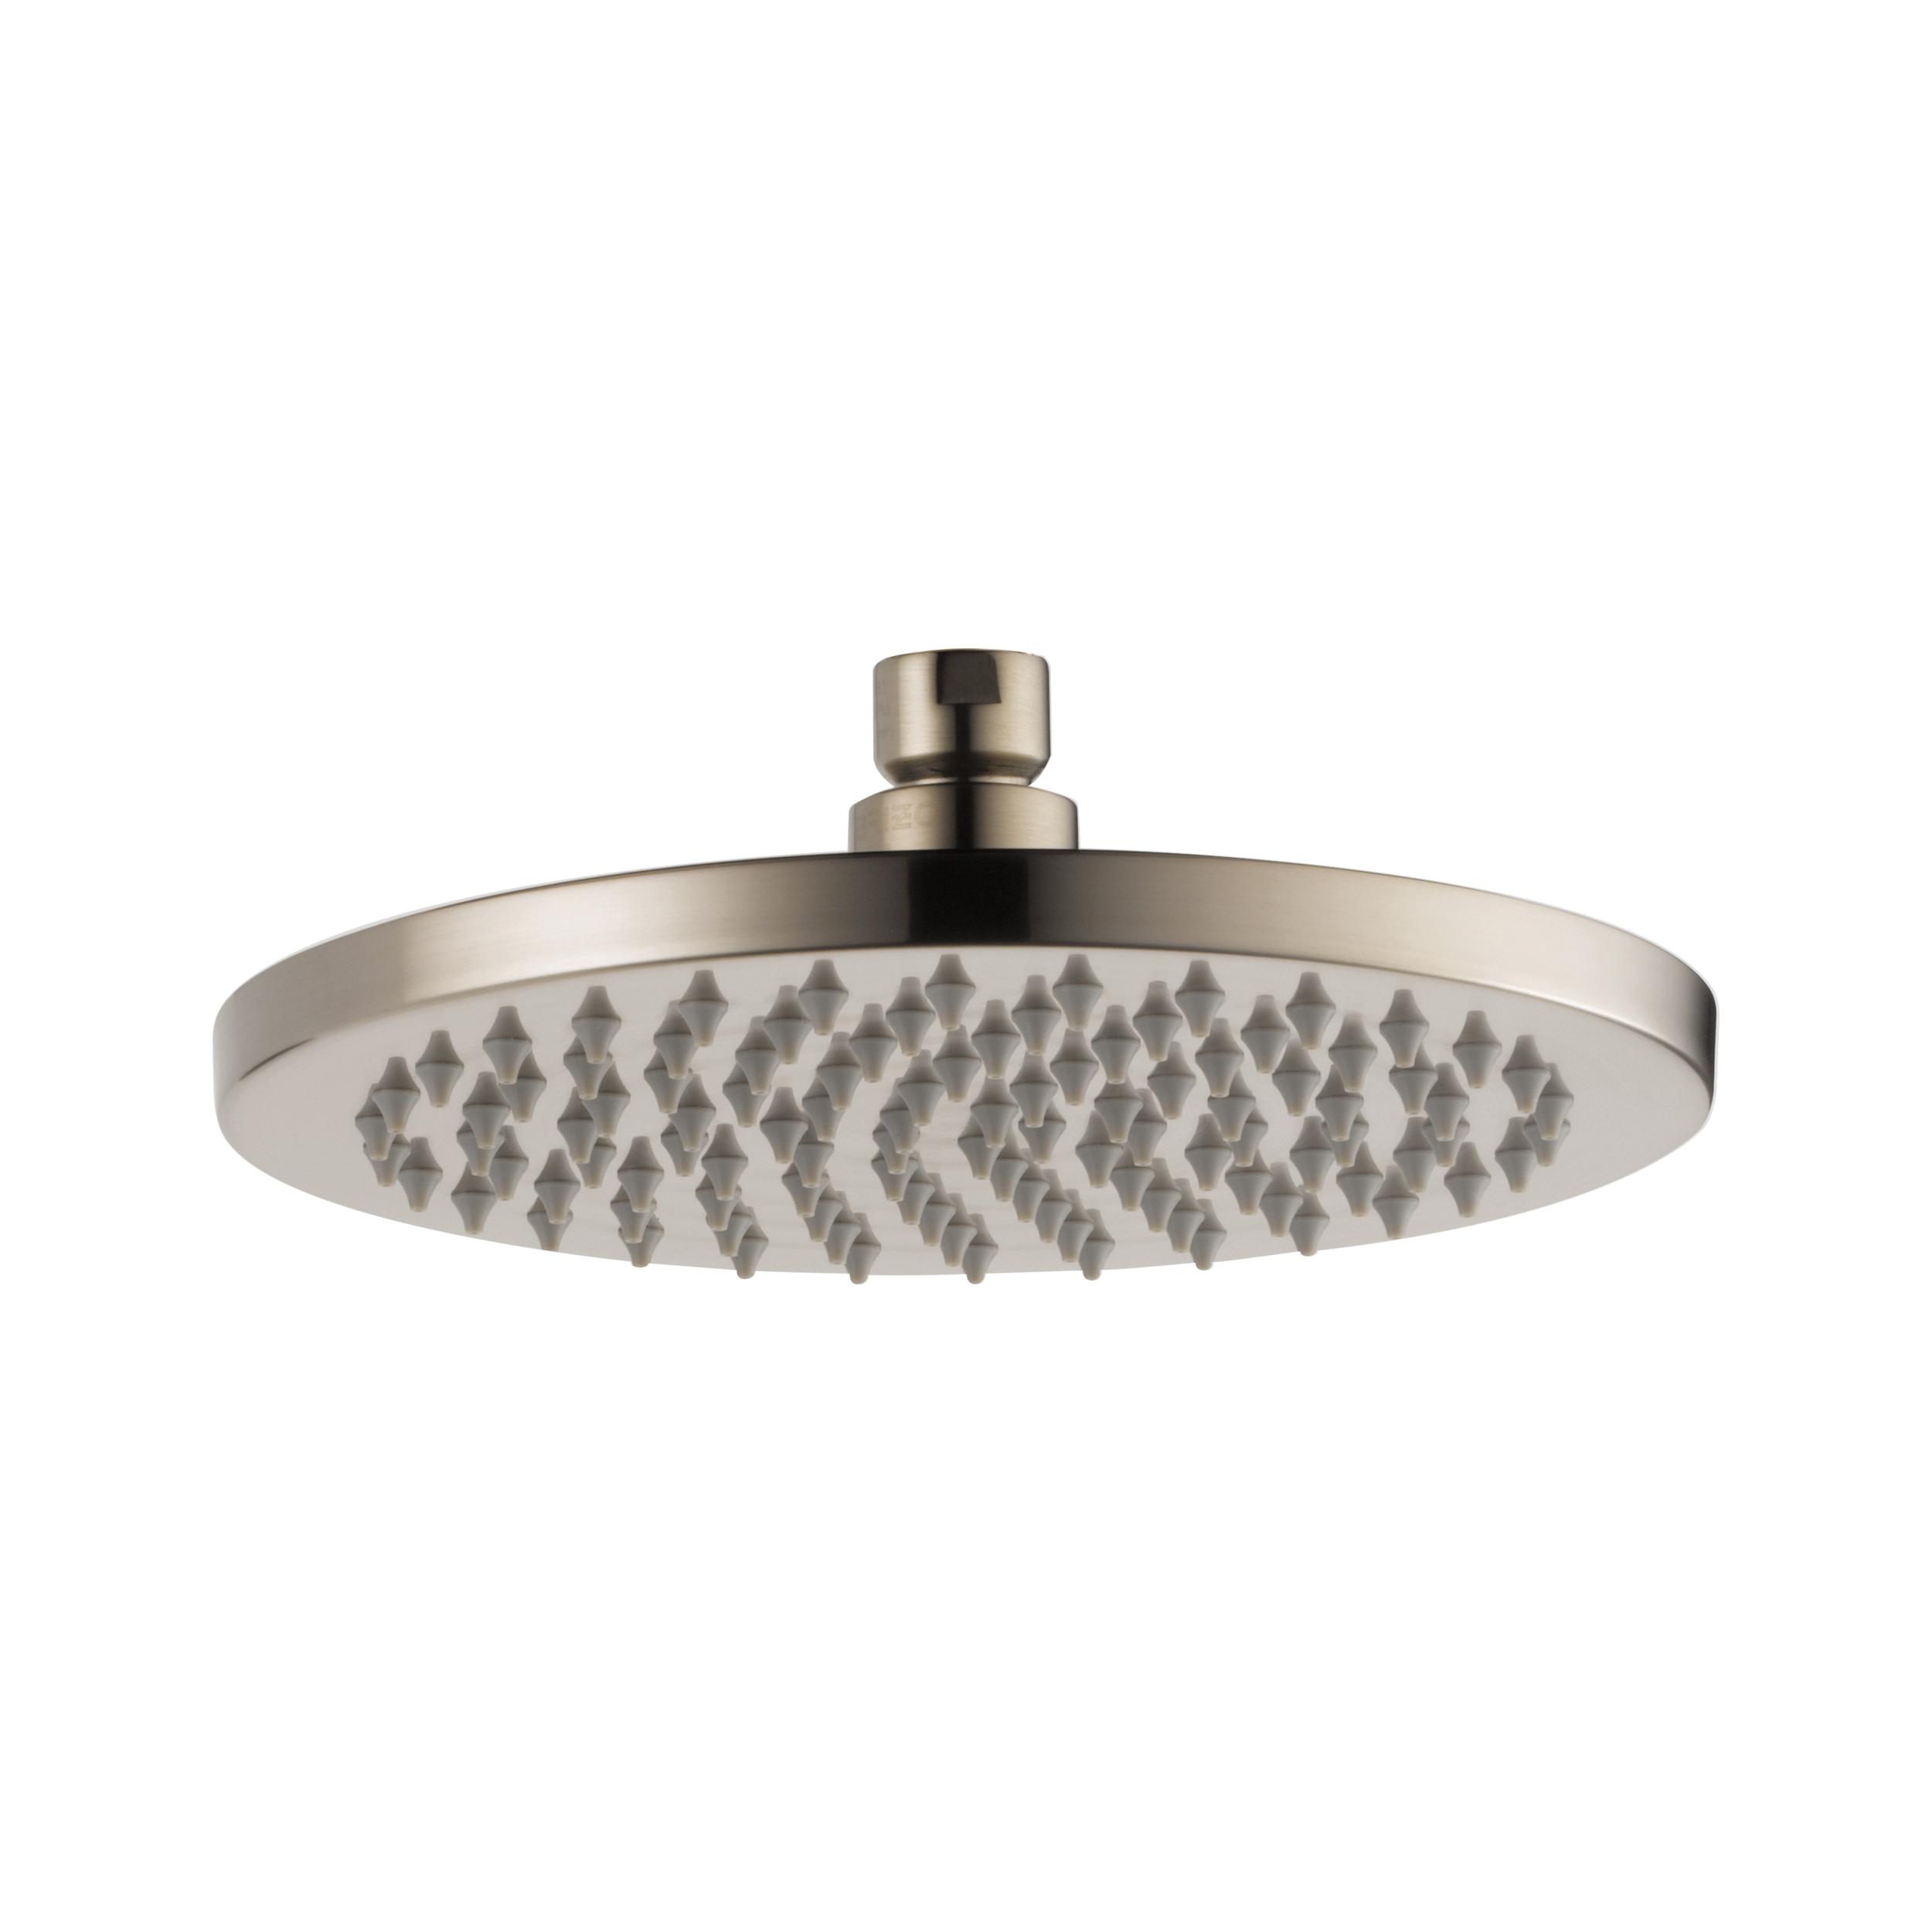 Brizo® 81375-BN-ECO Odin™ Raincan Shower Head, 2 gpm Maximum, 1 Spray, Ceiling Mount, 7-7/8 in Dia x 2-5/8 in H Head, Import